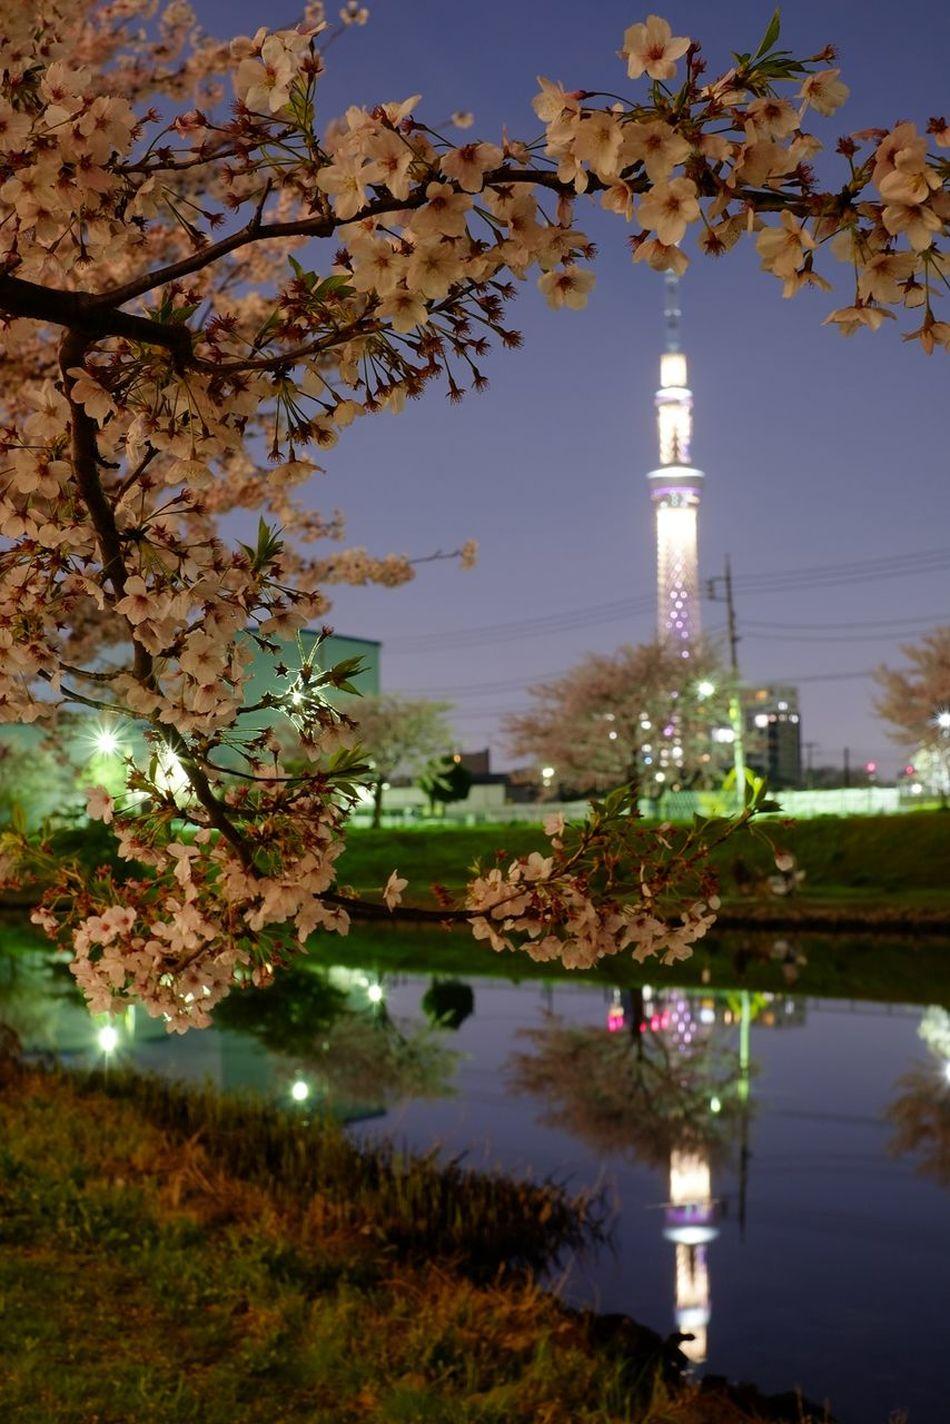 Sakura Tokyoskytree Tokyo,Japan 夜桜 ソメイヨシノ 桜 Fujifilm X-E2 東京スカイツリー